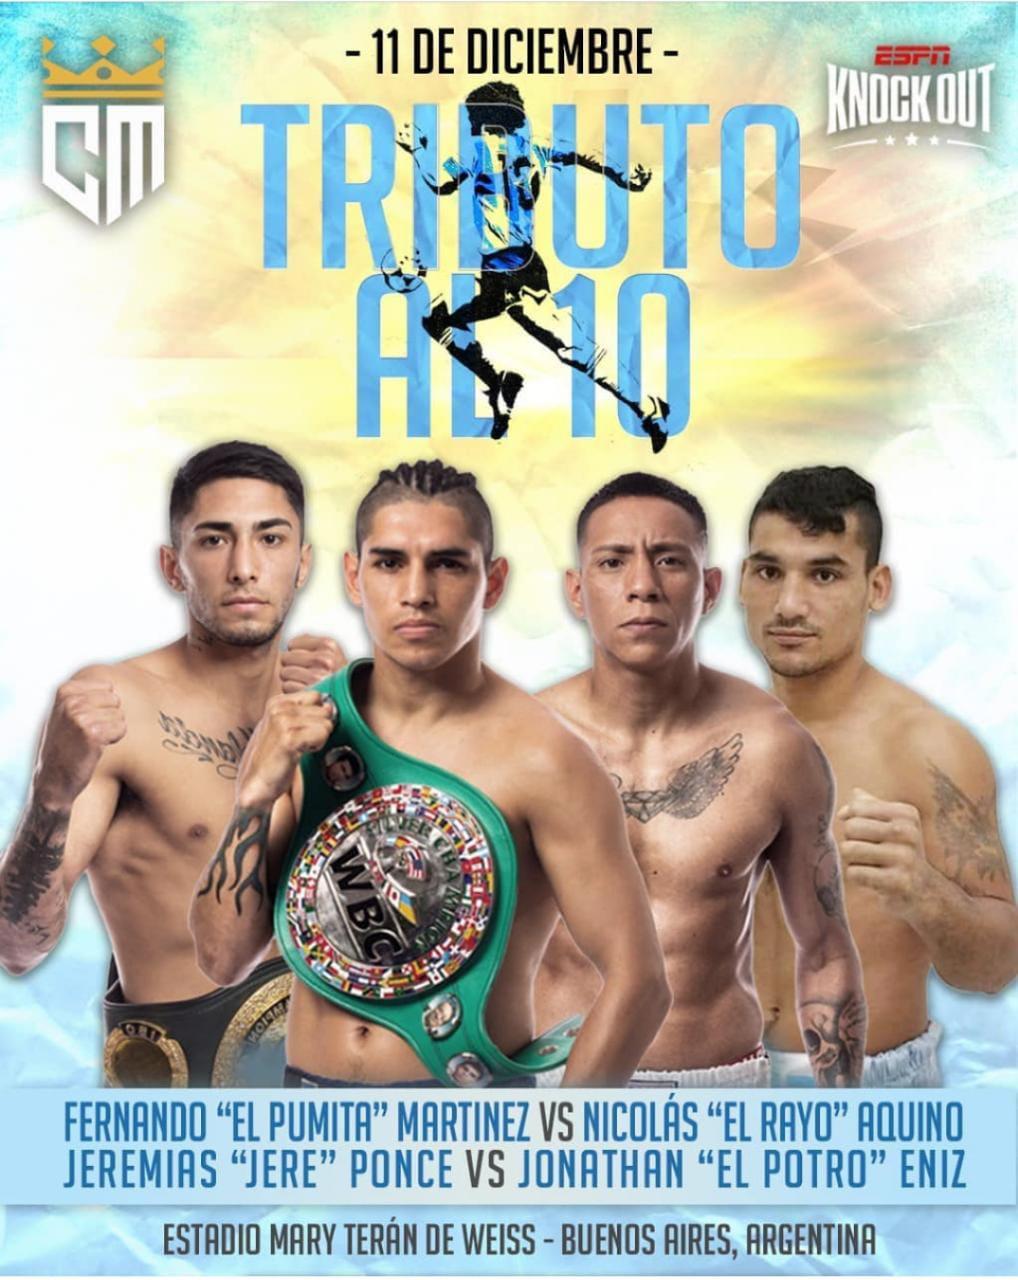 Chino Maidana Promotions realiza velada con 14 peleas profesionales